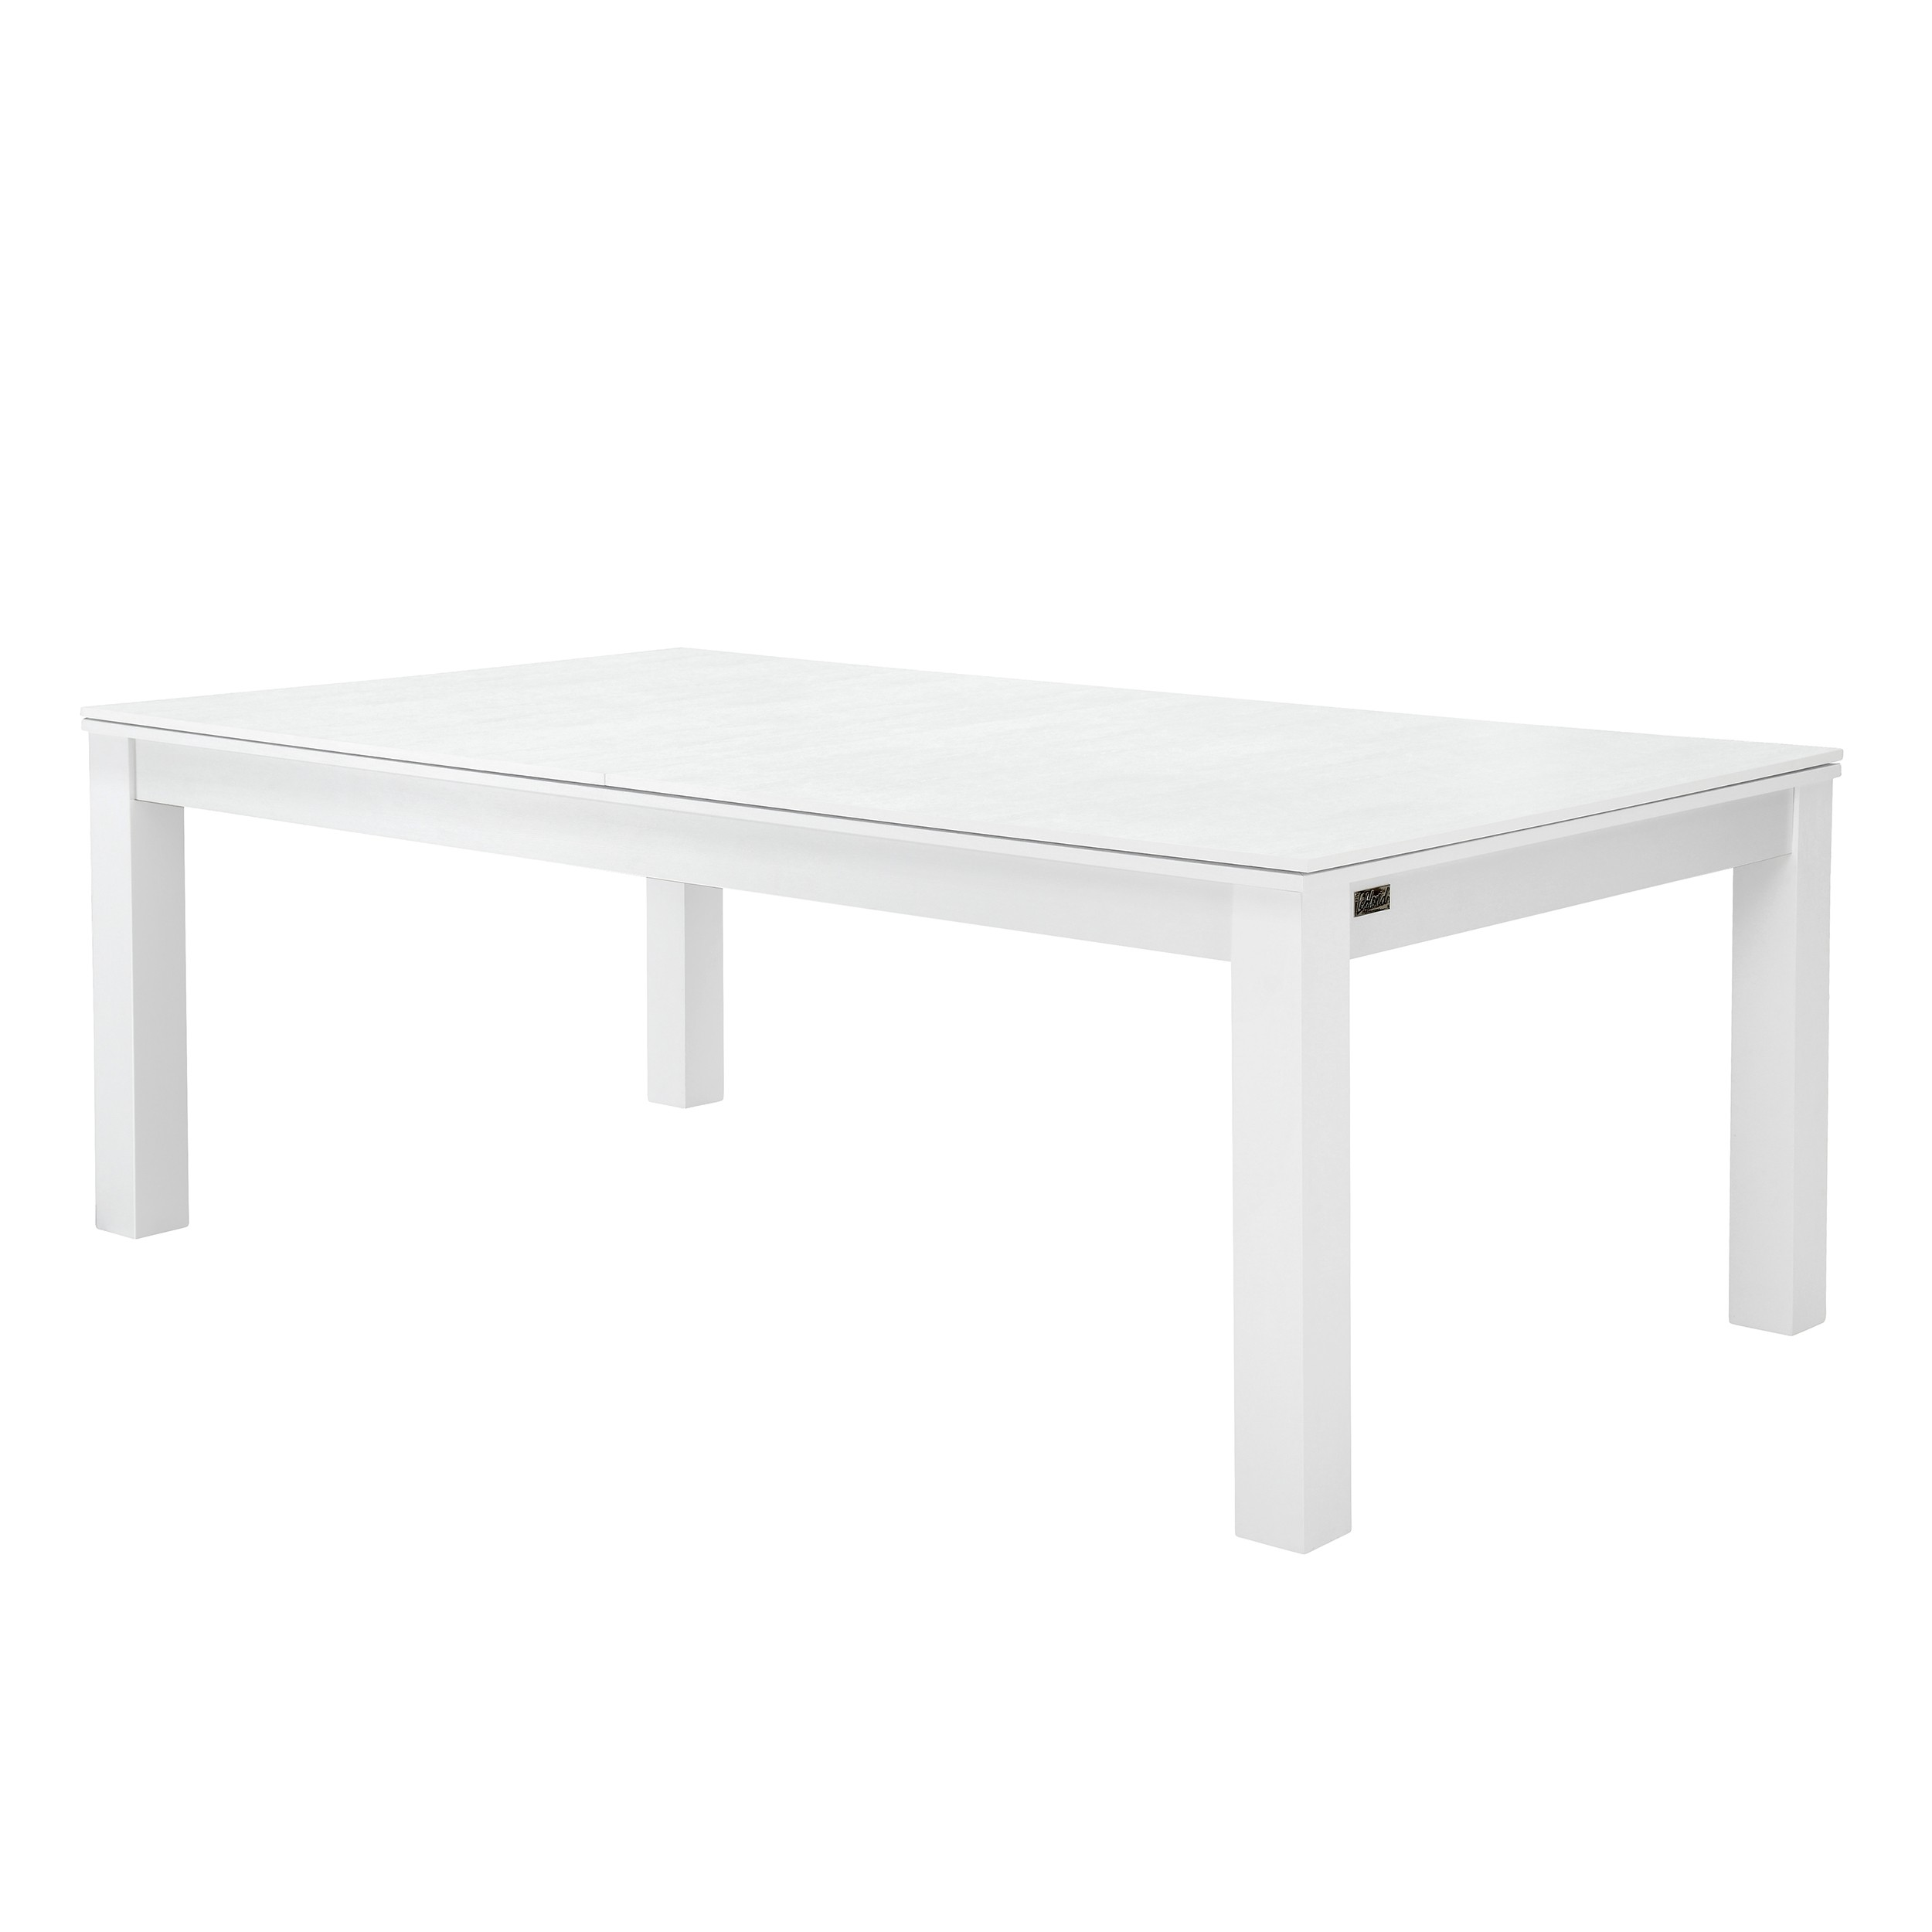 Billard-table convertible blanc tapis gris : commandez les billard ...